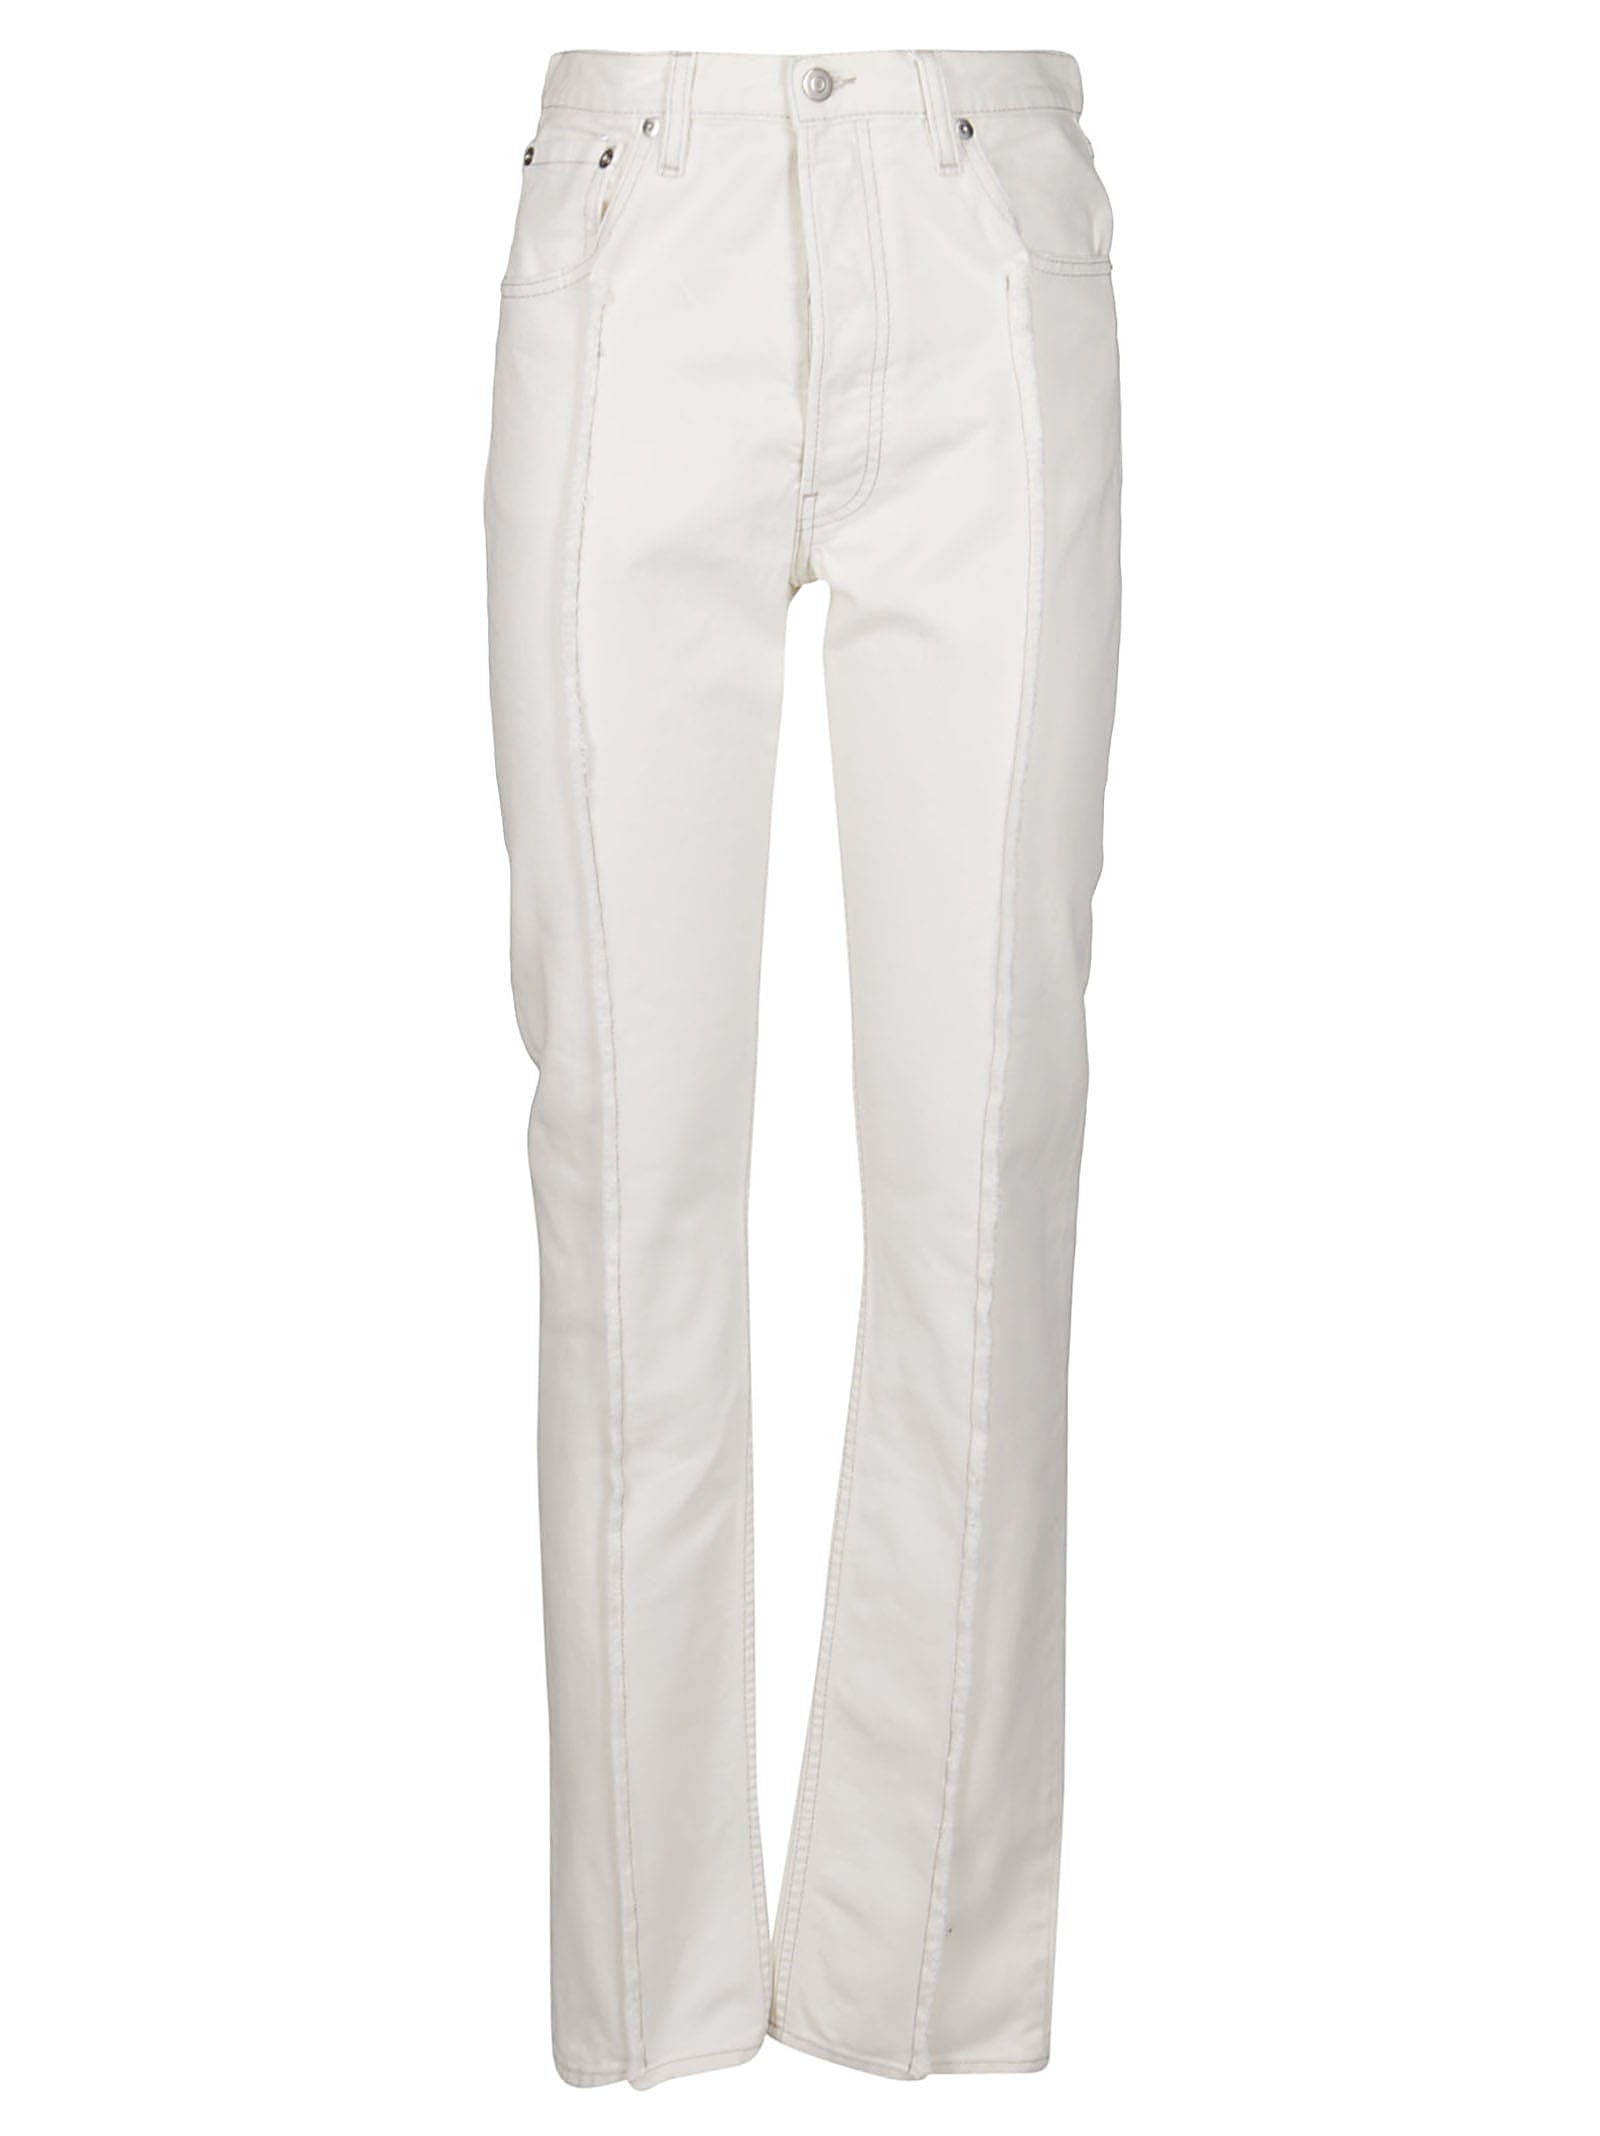 White Cotton Jeans